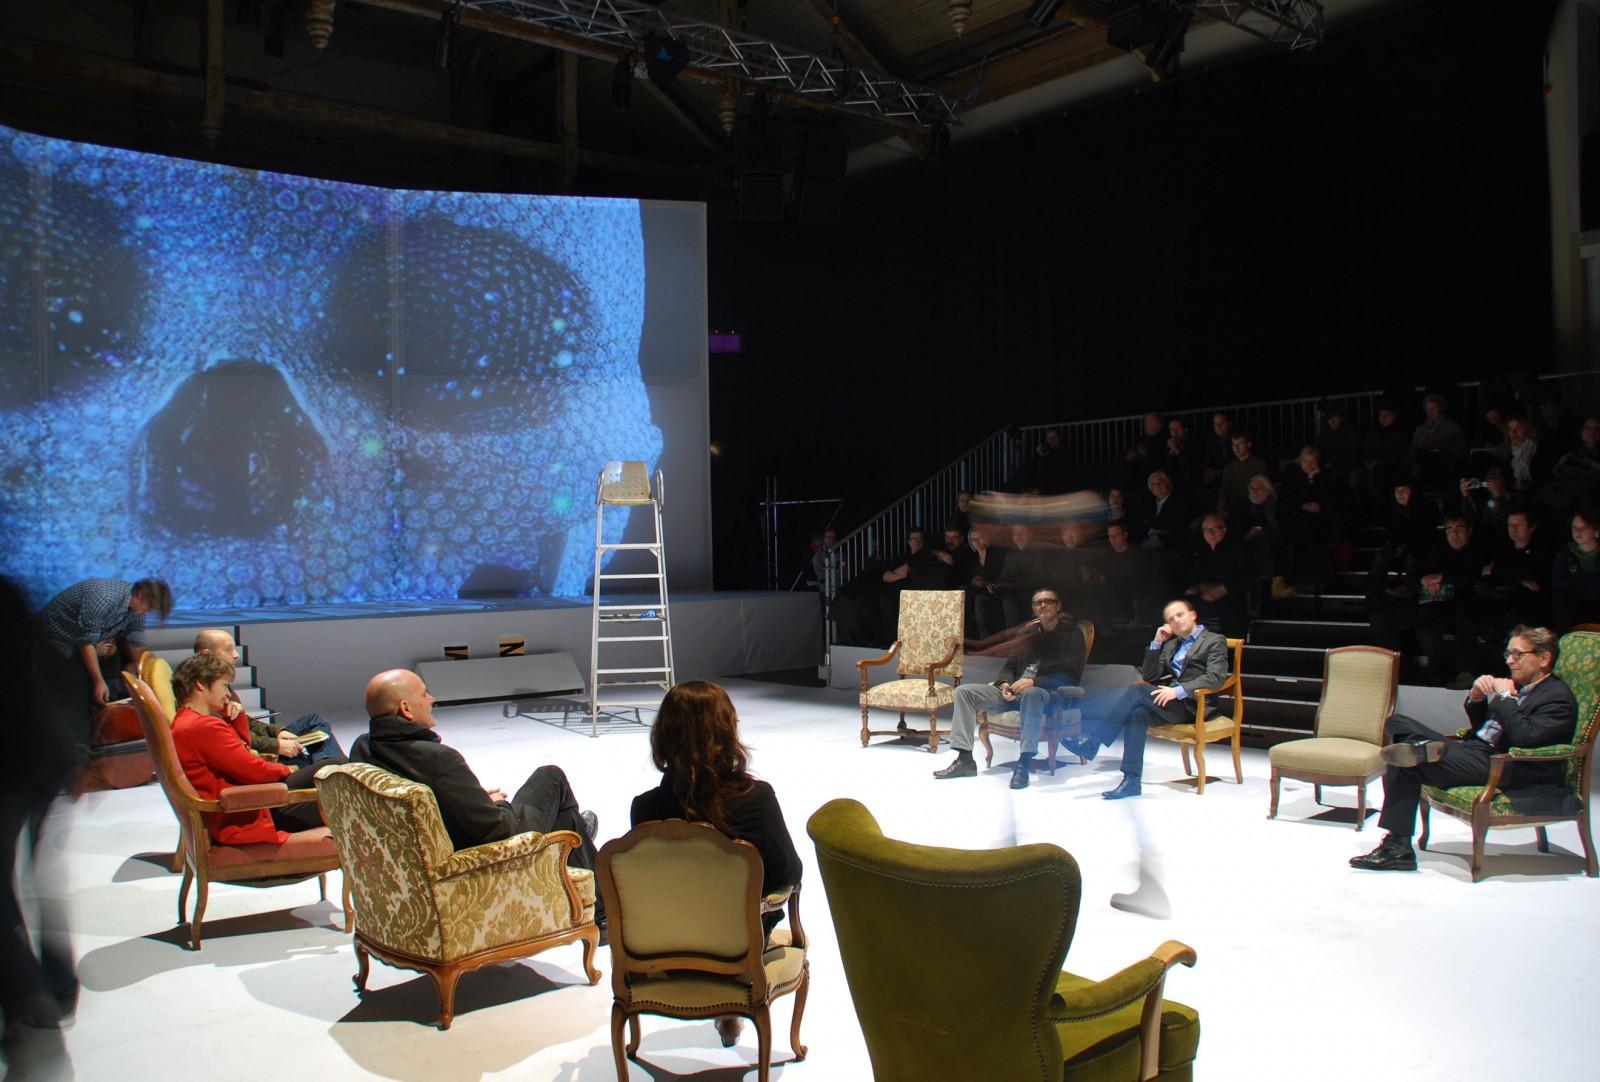 exhibit – scenography in exhibition design | de-lay, Innenarchitektur ideen